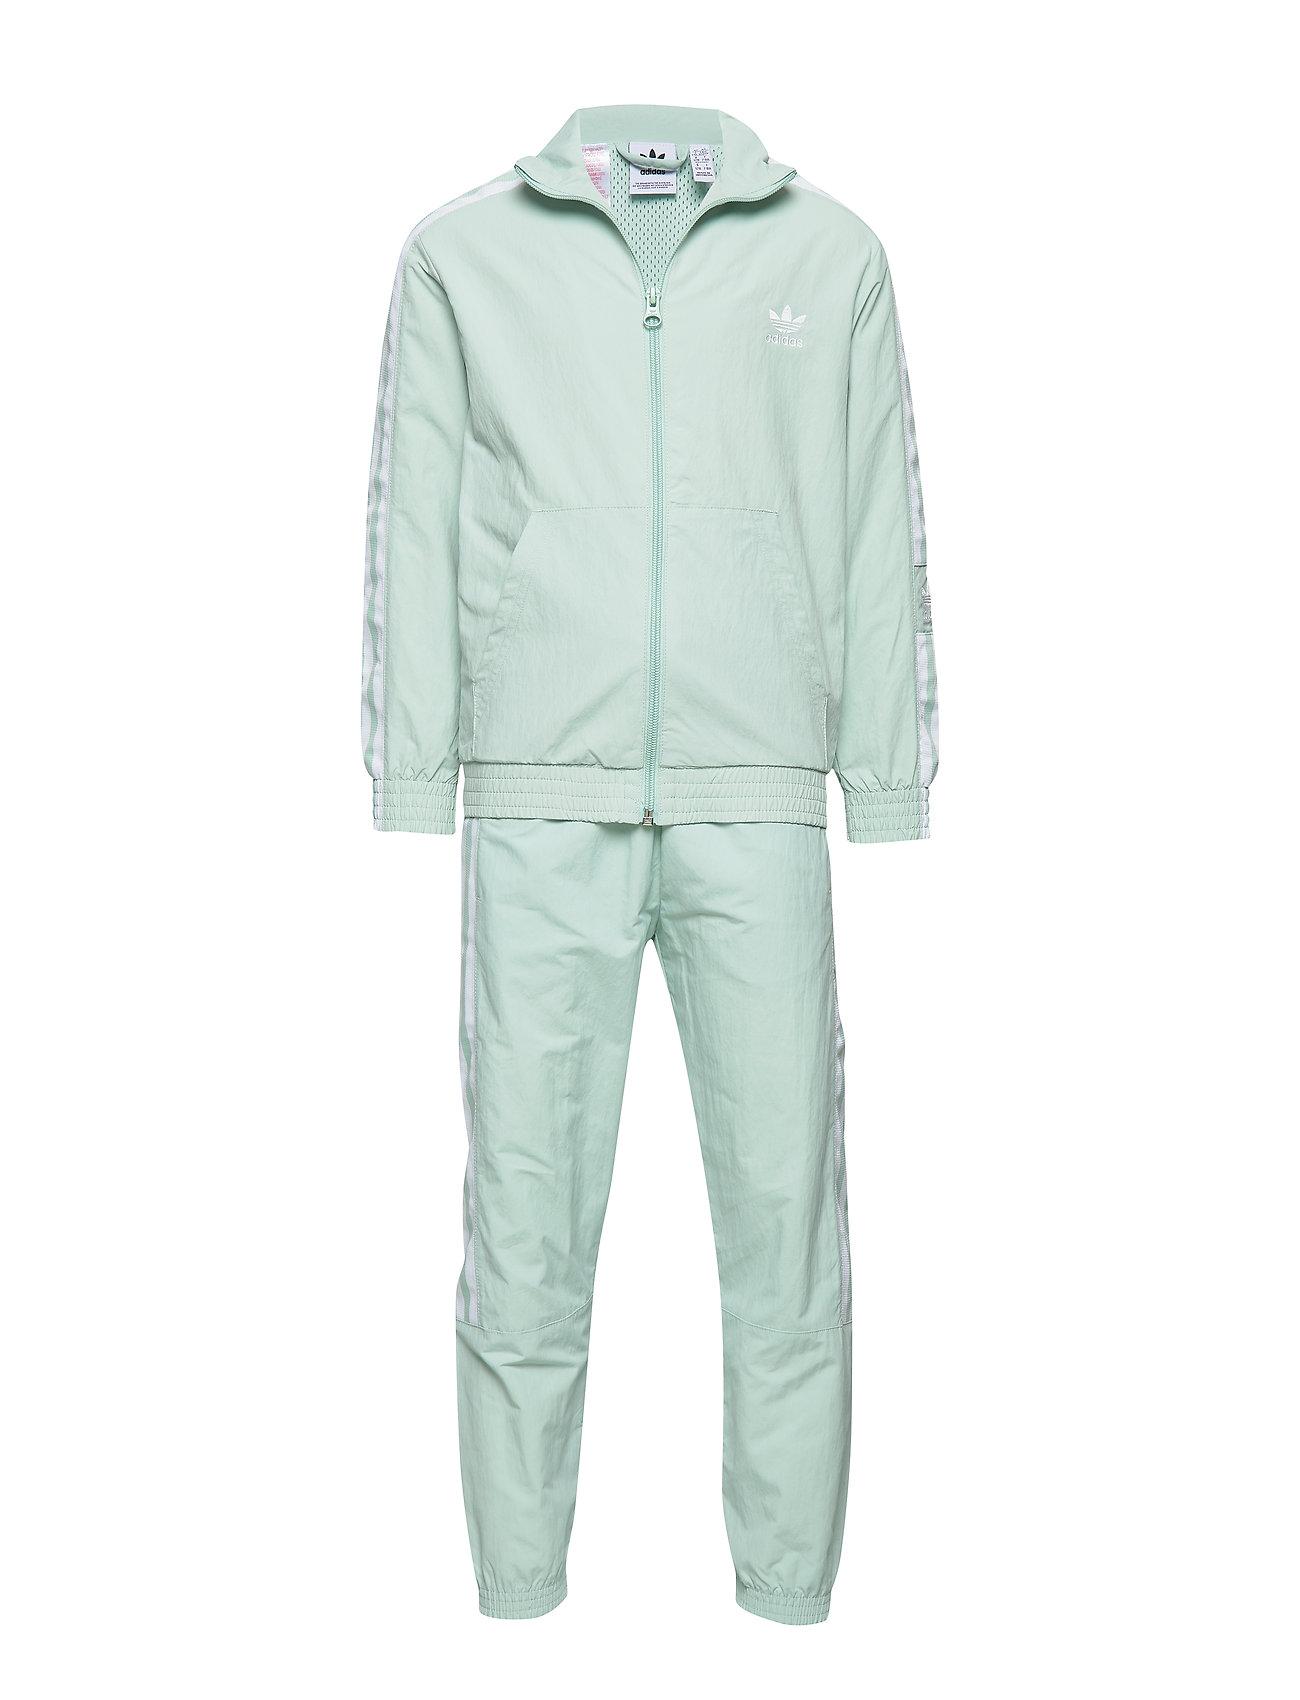 adidas Originals NEW ICON TS - VAPGRN/WHITE